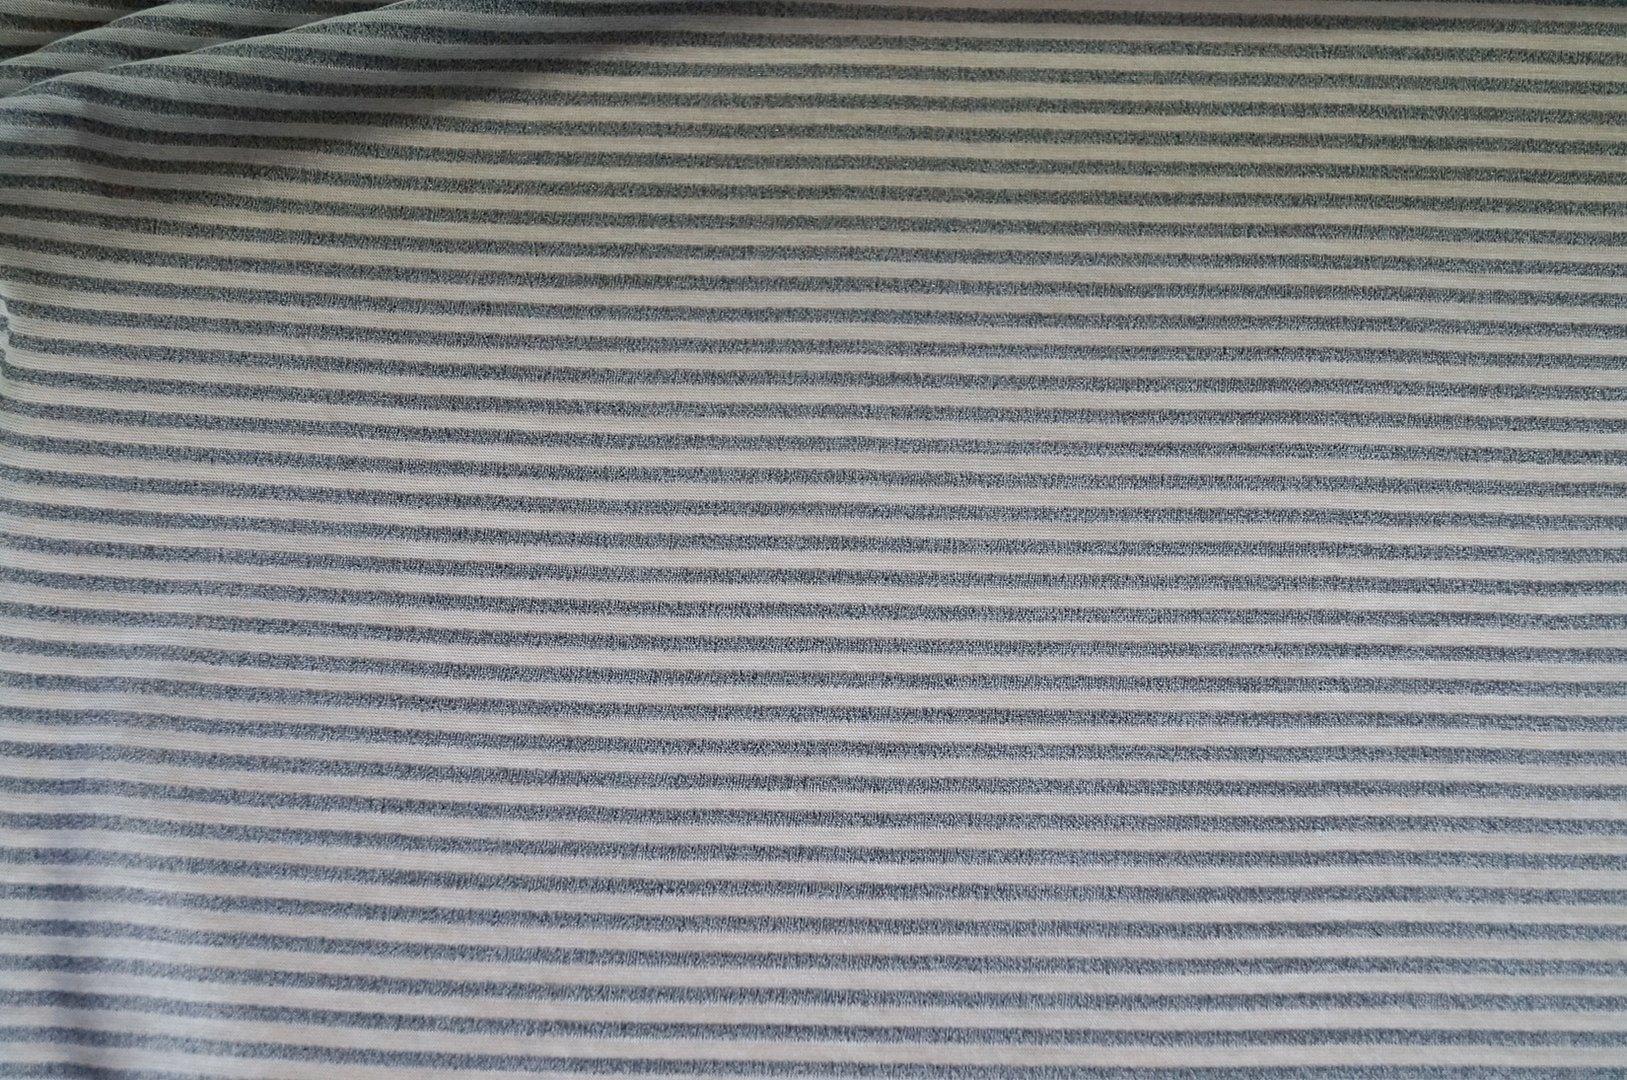 jersey stoffe jersey stoff grau fein gestreift wei. Black Bedroom Furniture Sets. Home Design Ideas